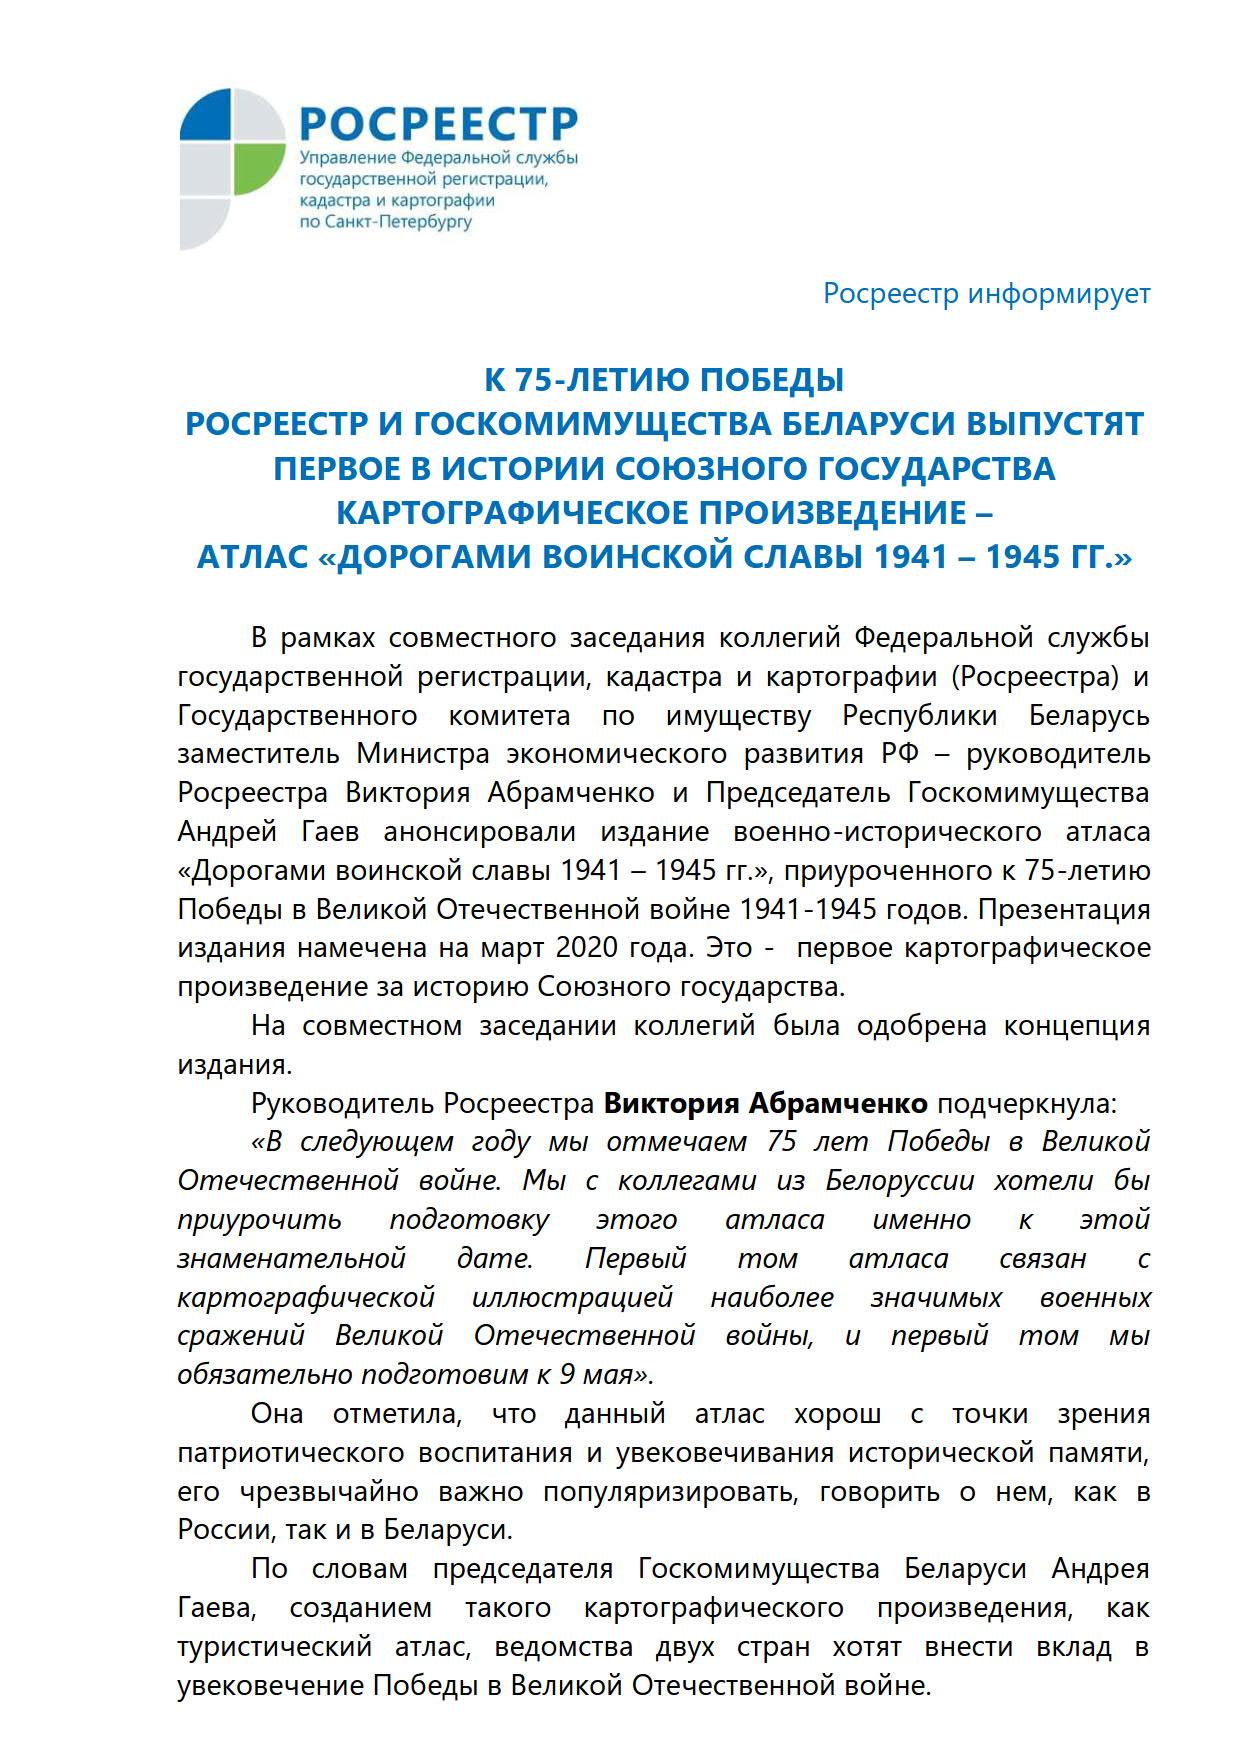 п-р_к75-летиюПобеды_1